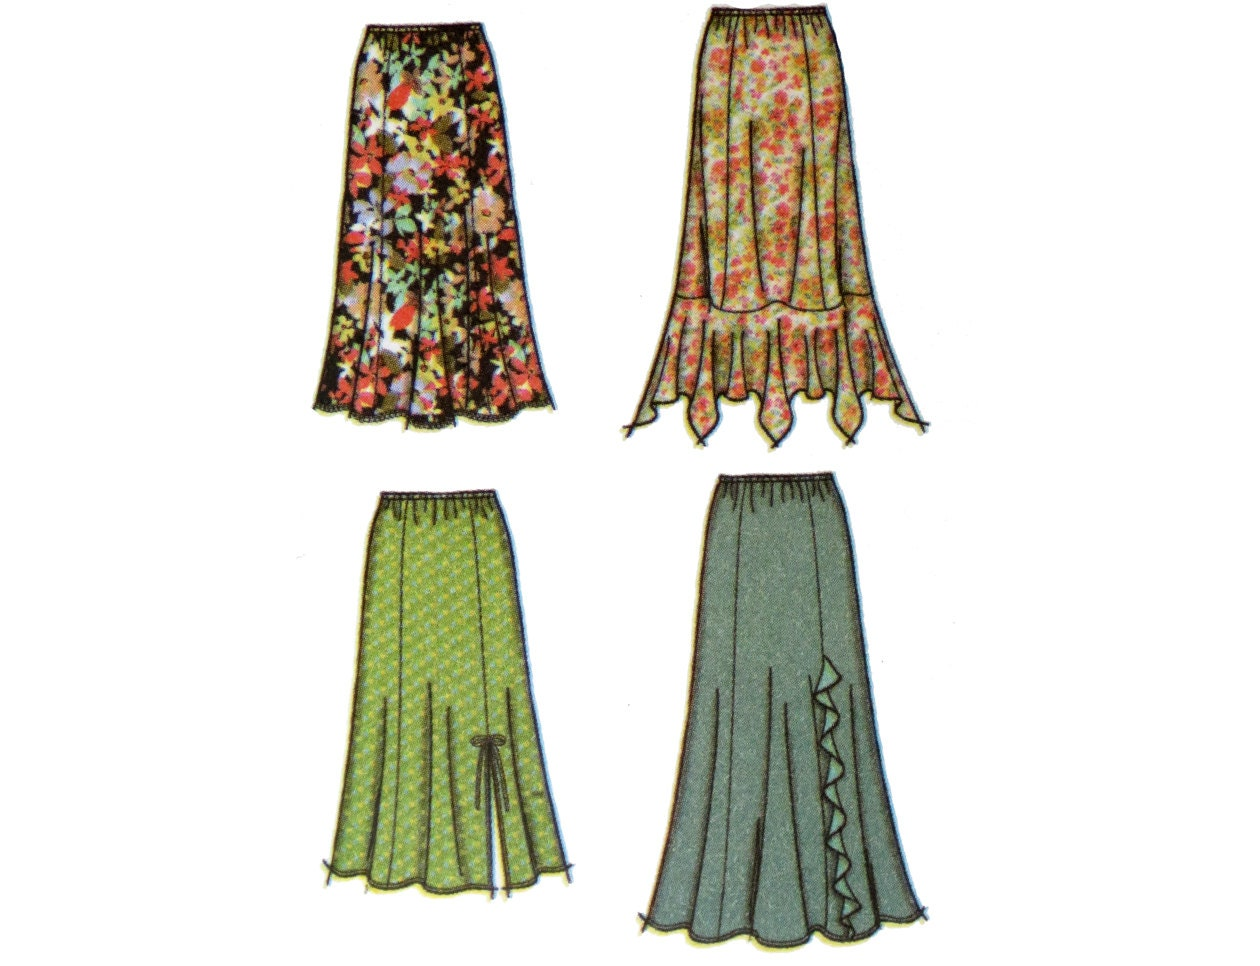 skirt pattern plus size simplicity 4706 khaliah ali collection